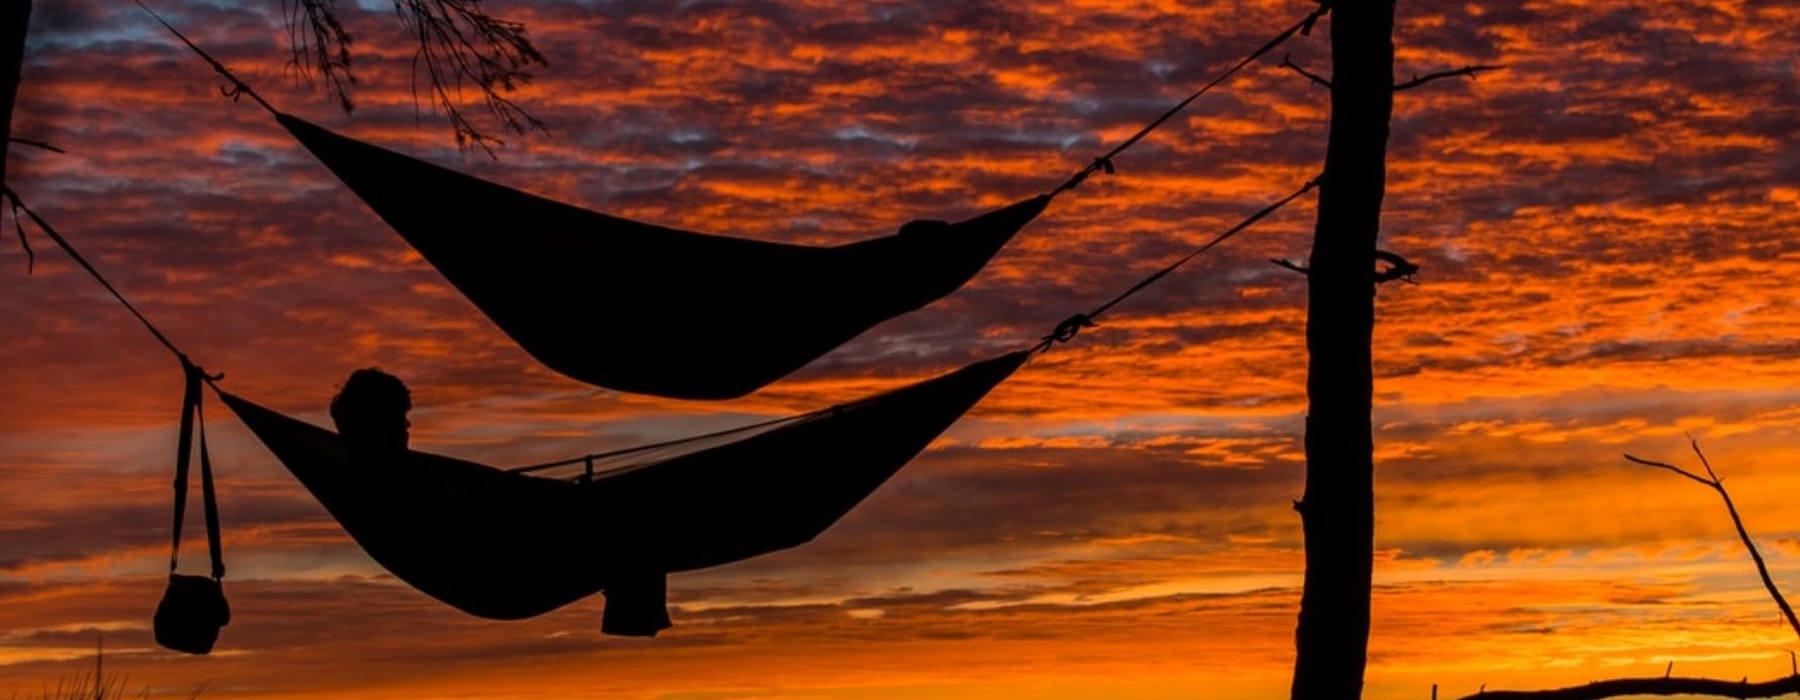 people in hammocks at dusk